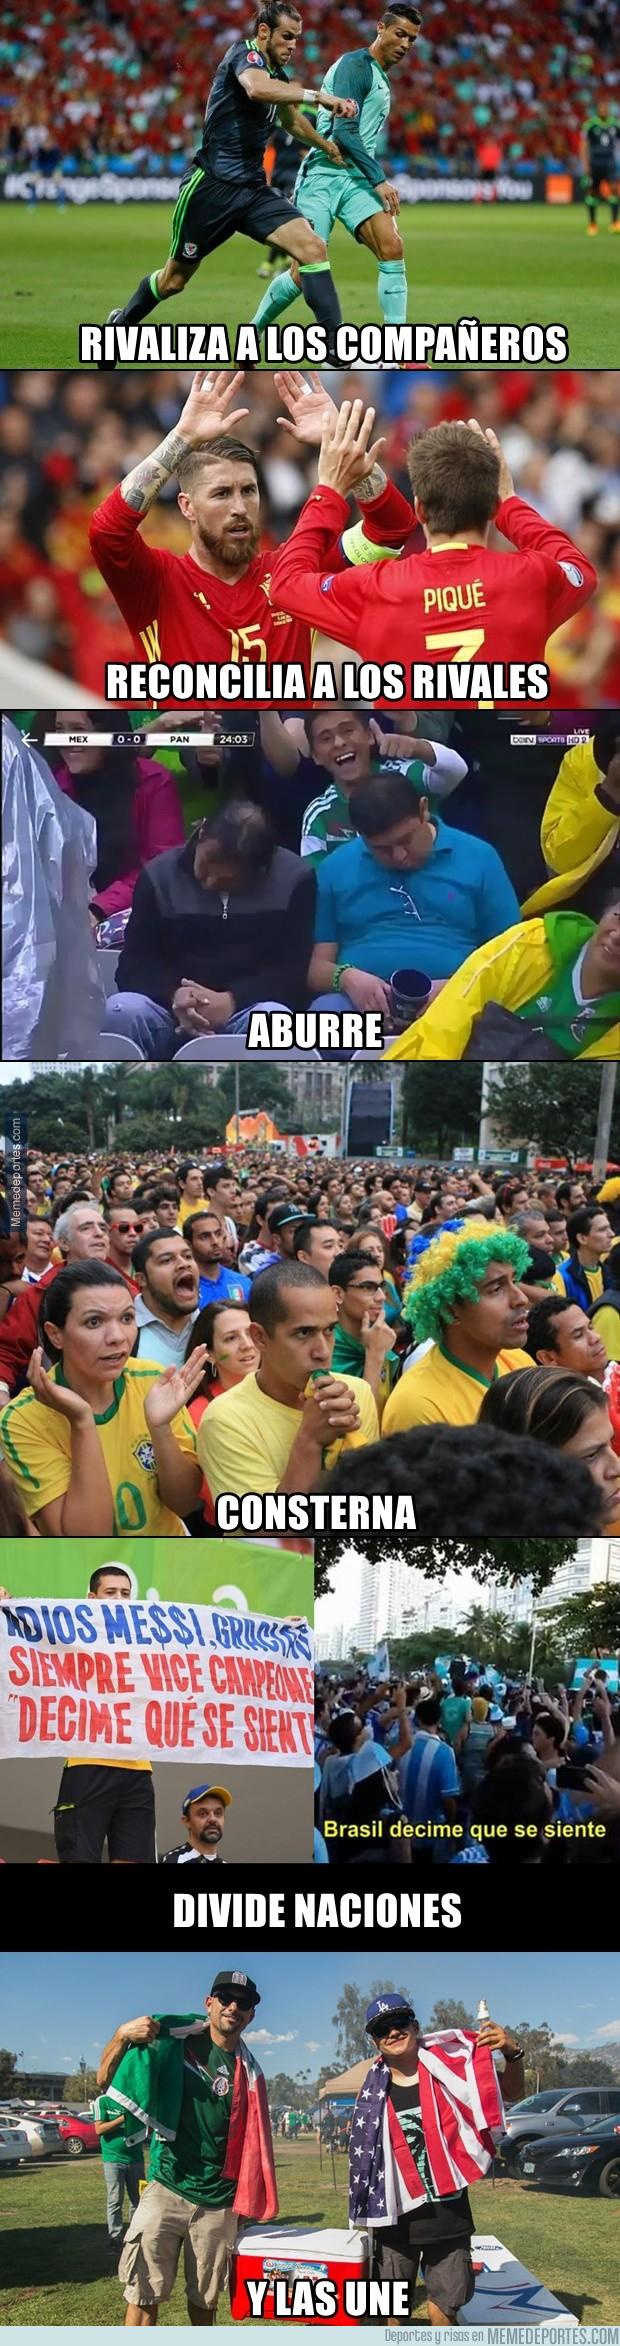 997163 - Jornadas FIFA